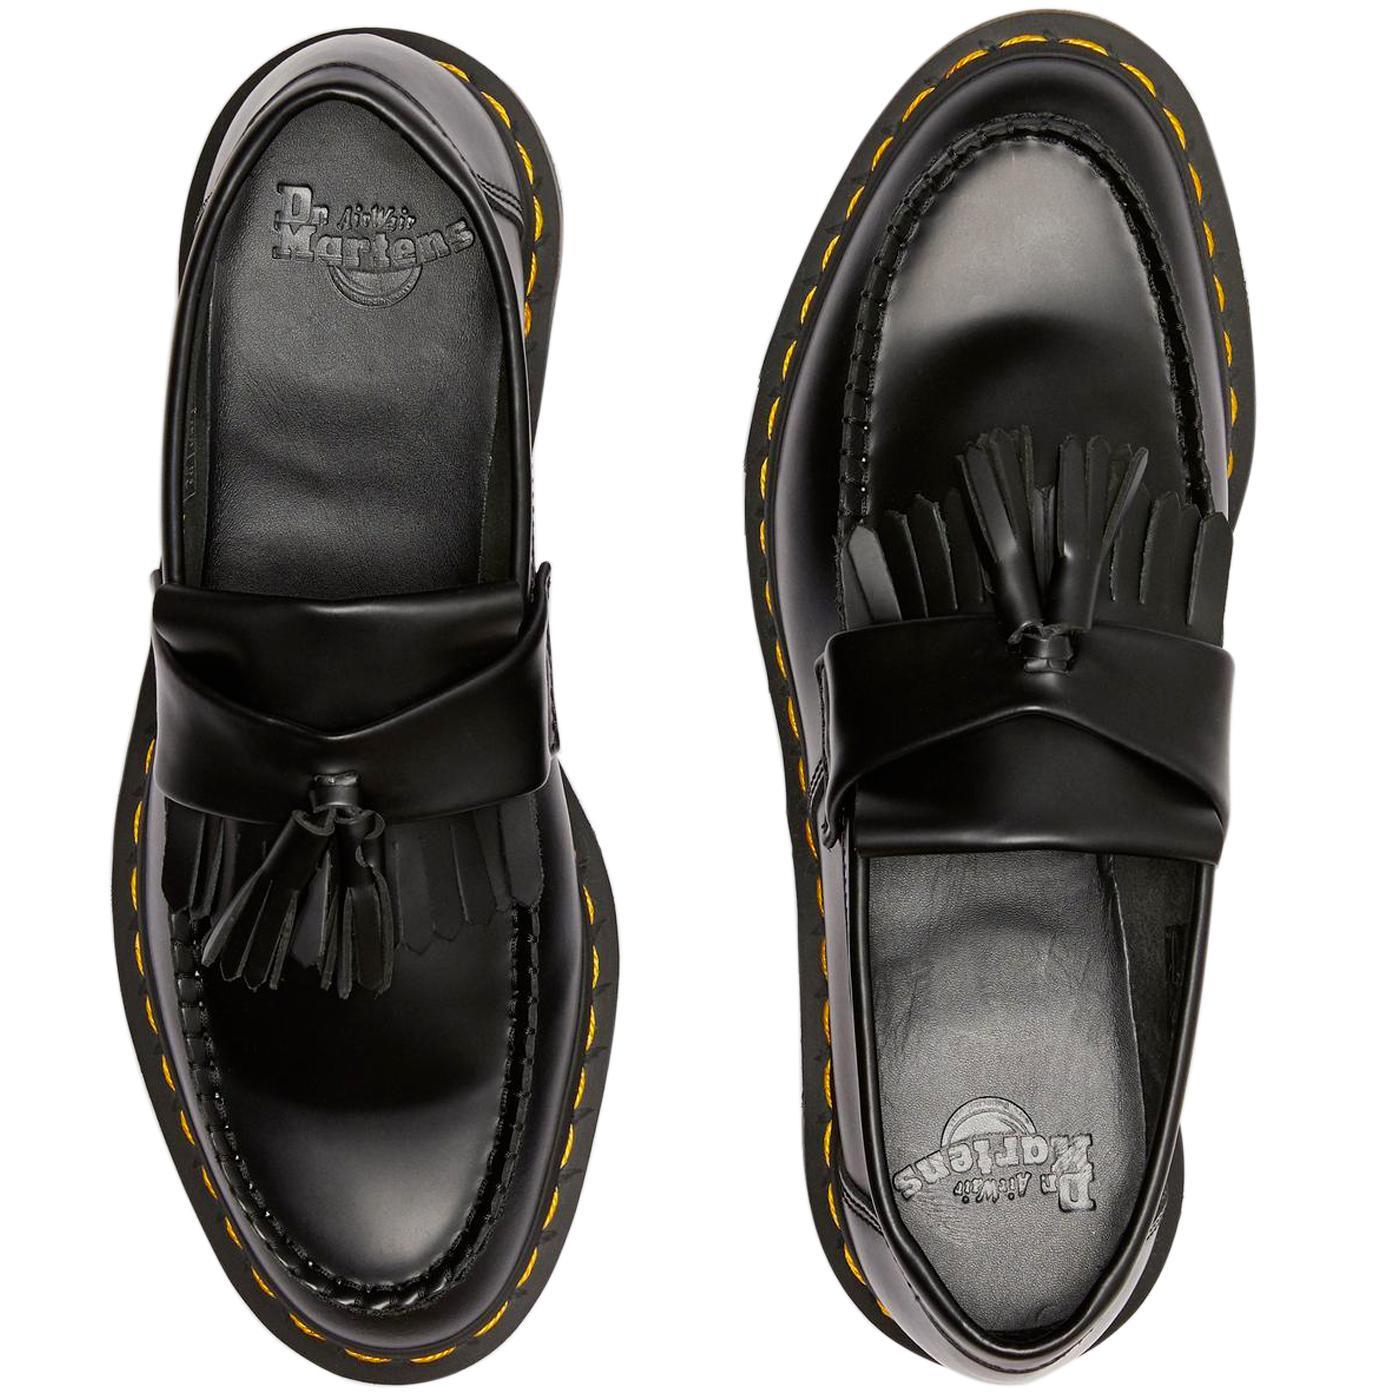 dr martens adrian tassel loafers in black